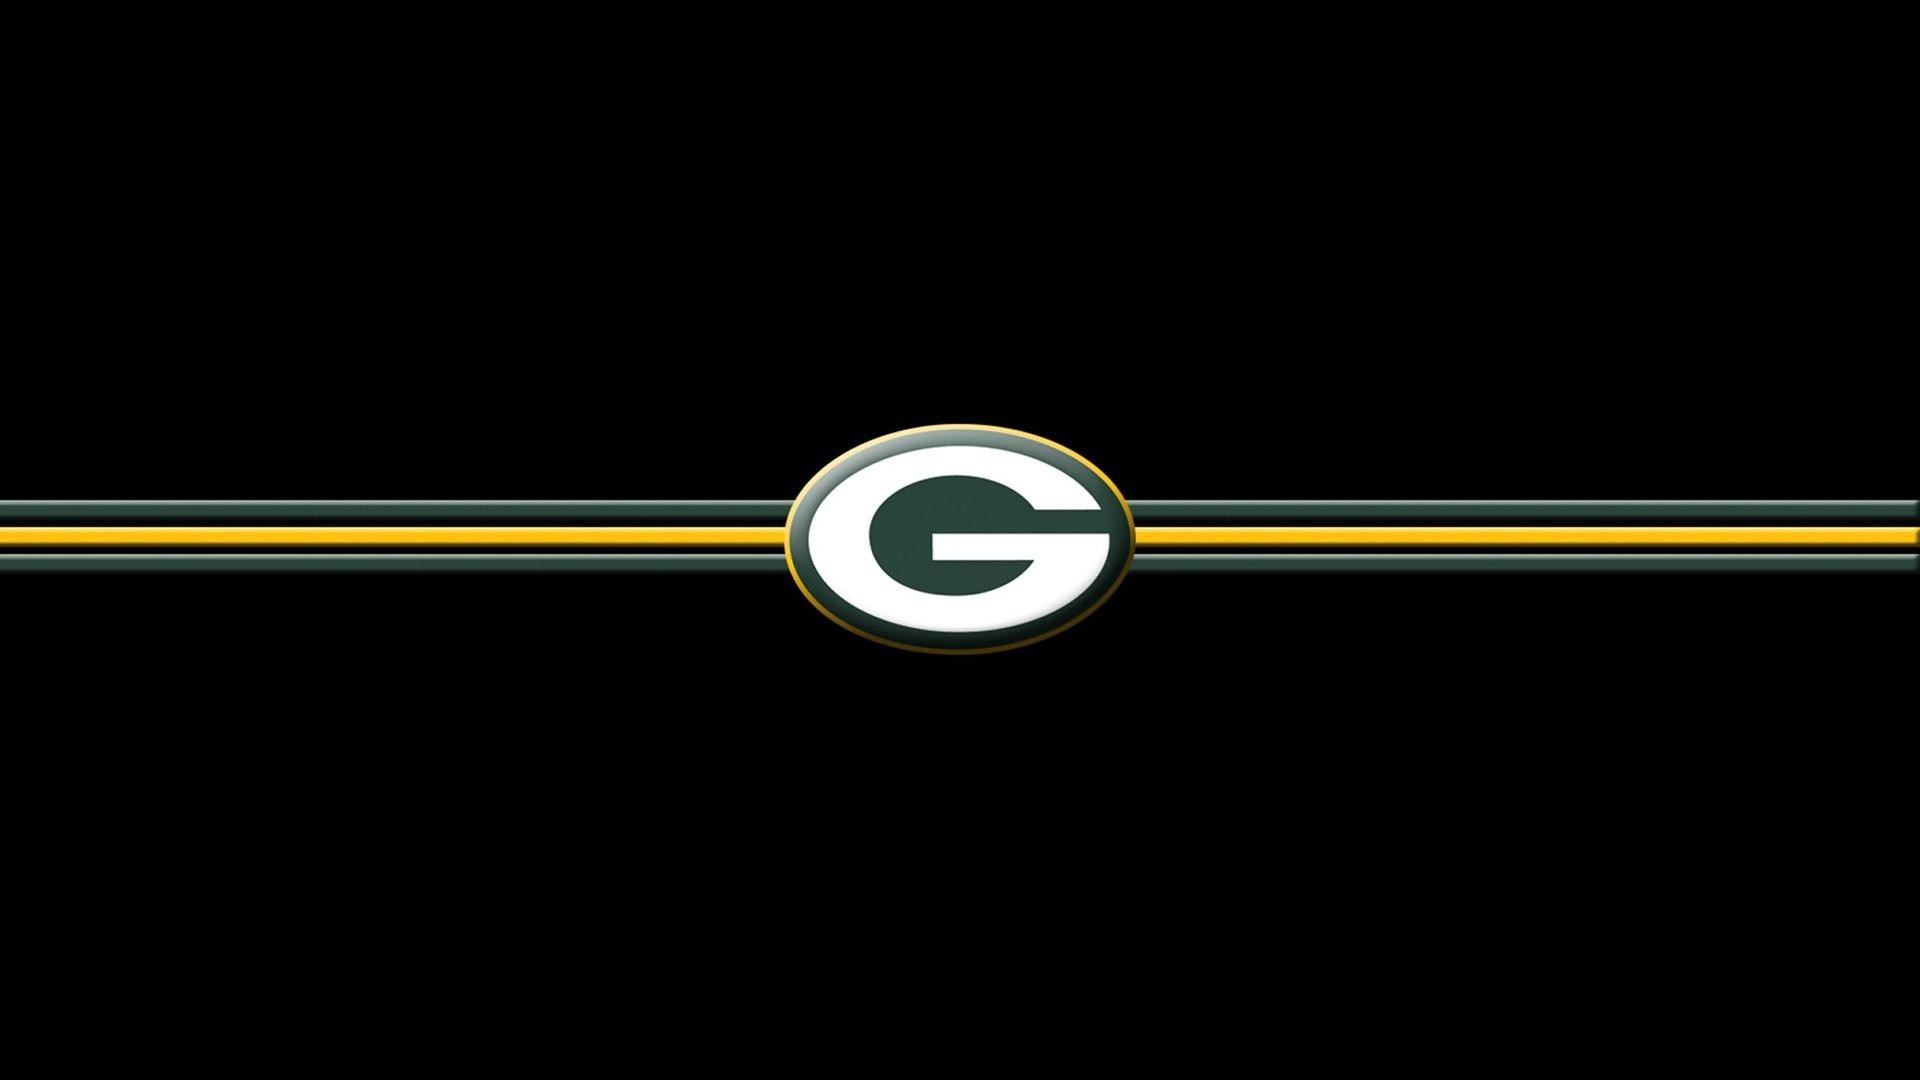 Green Bay Packers hd wallpaper download